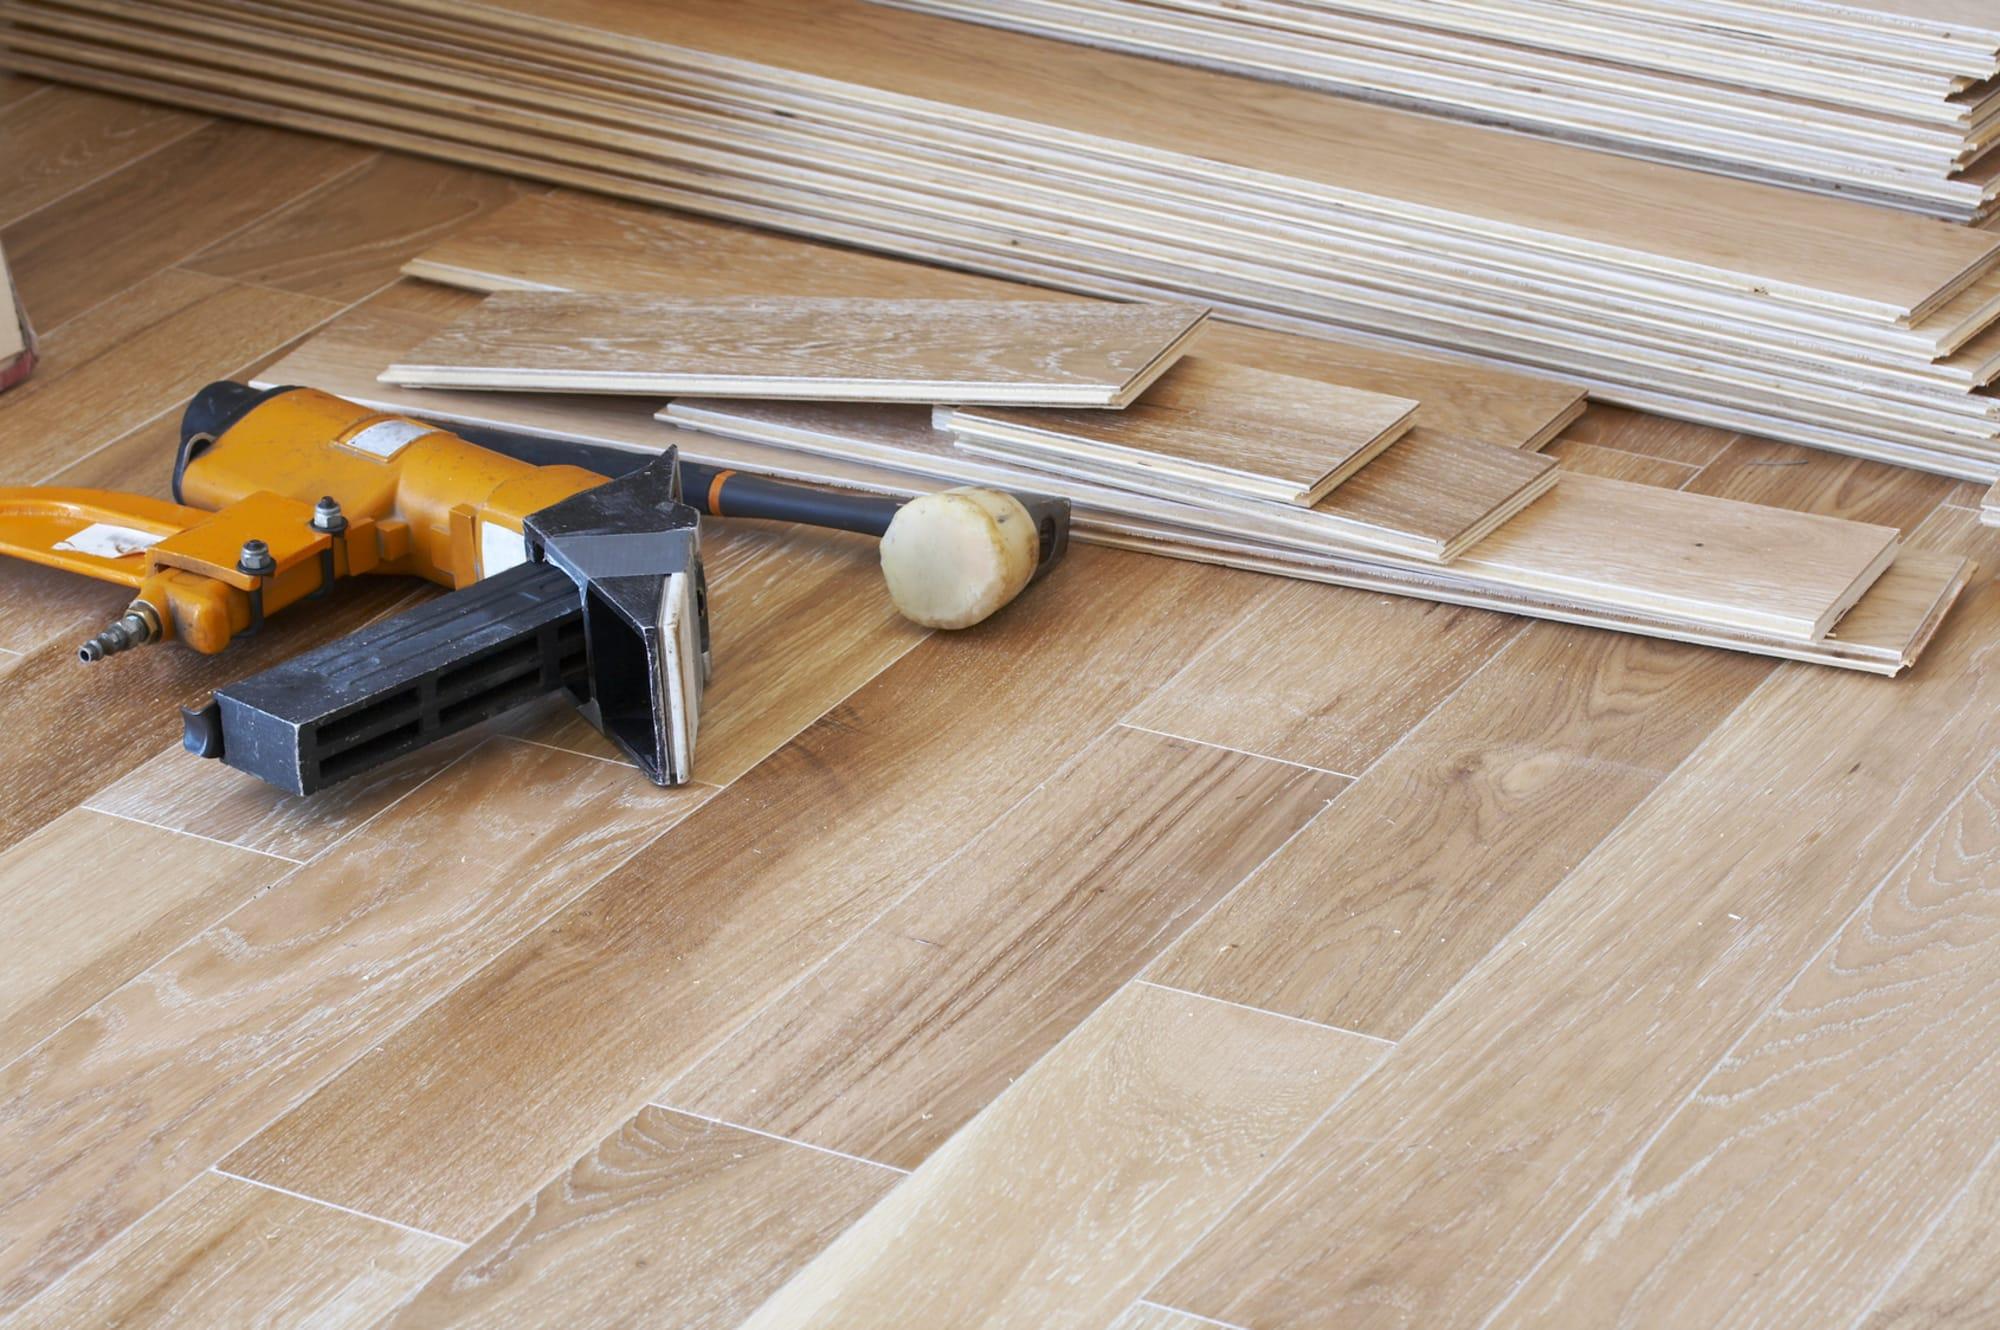 Top 5 Flooring S In Baton Rouge, Laminate Flooring Baton Rouge